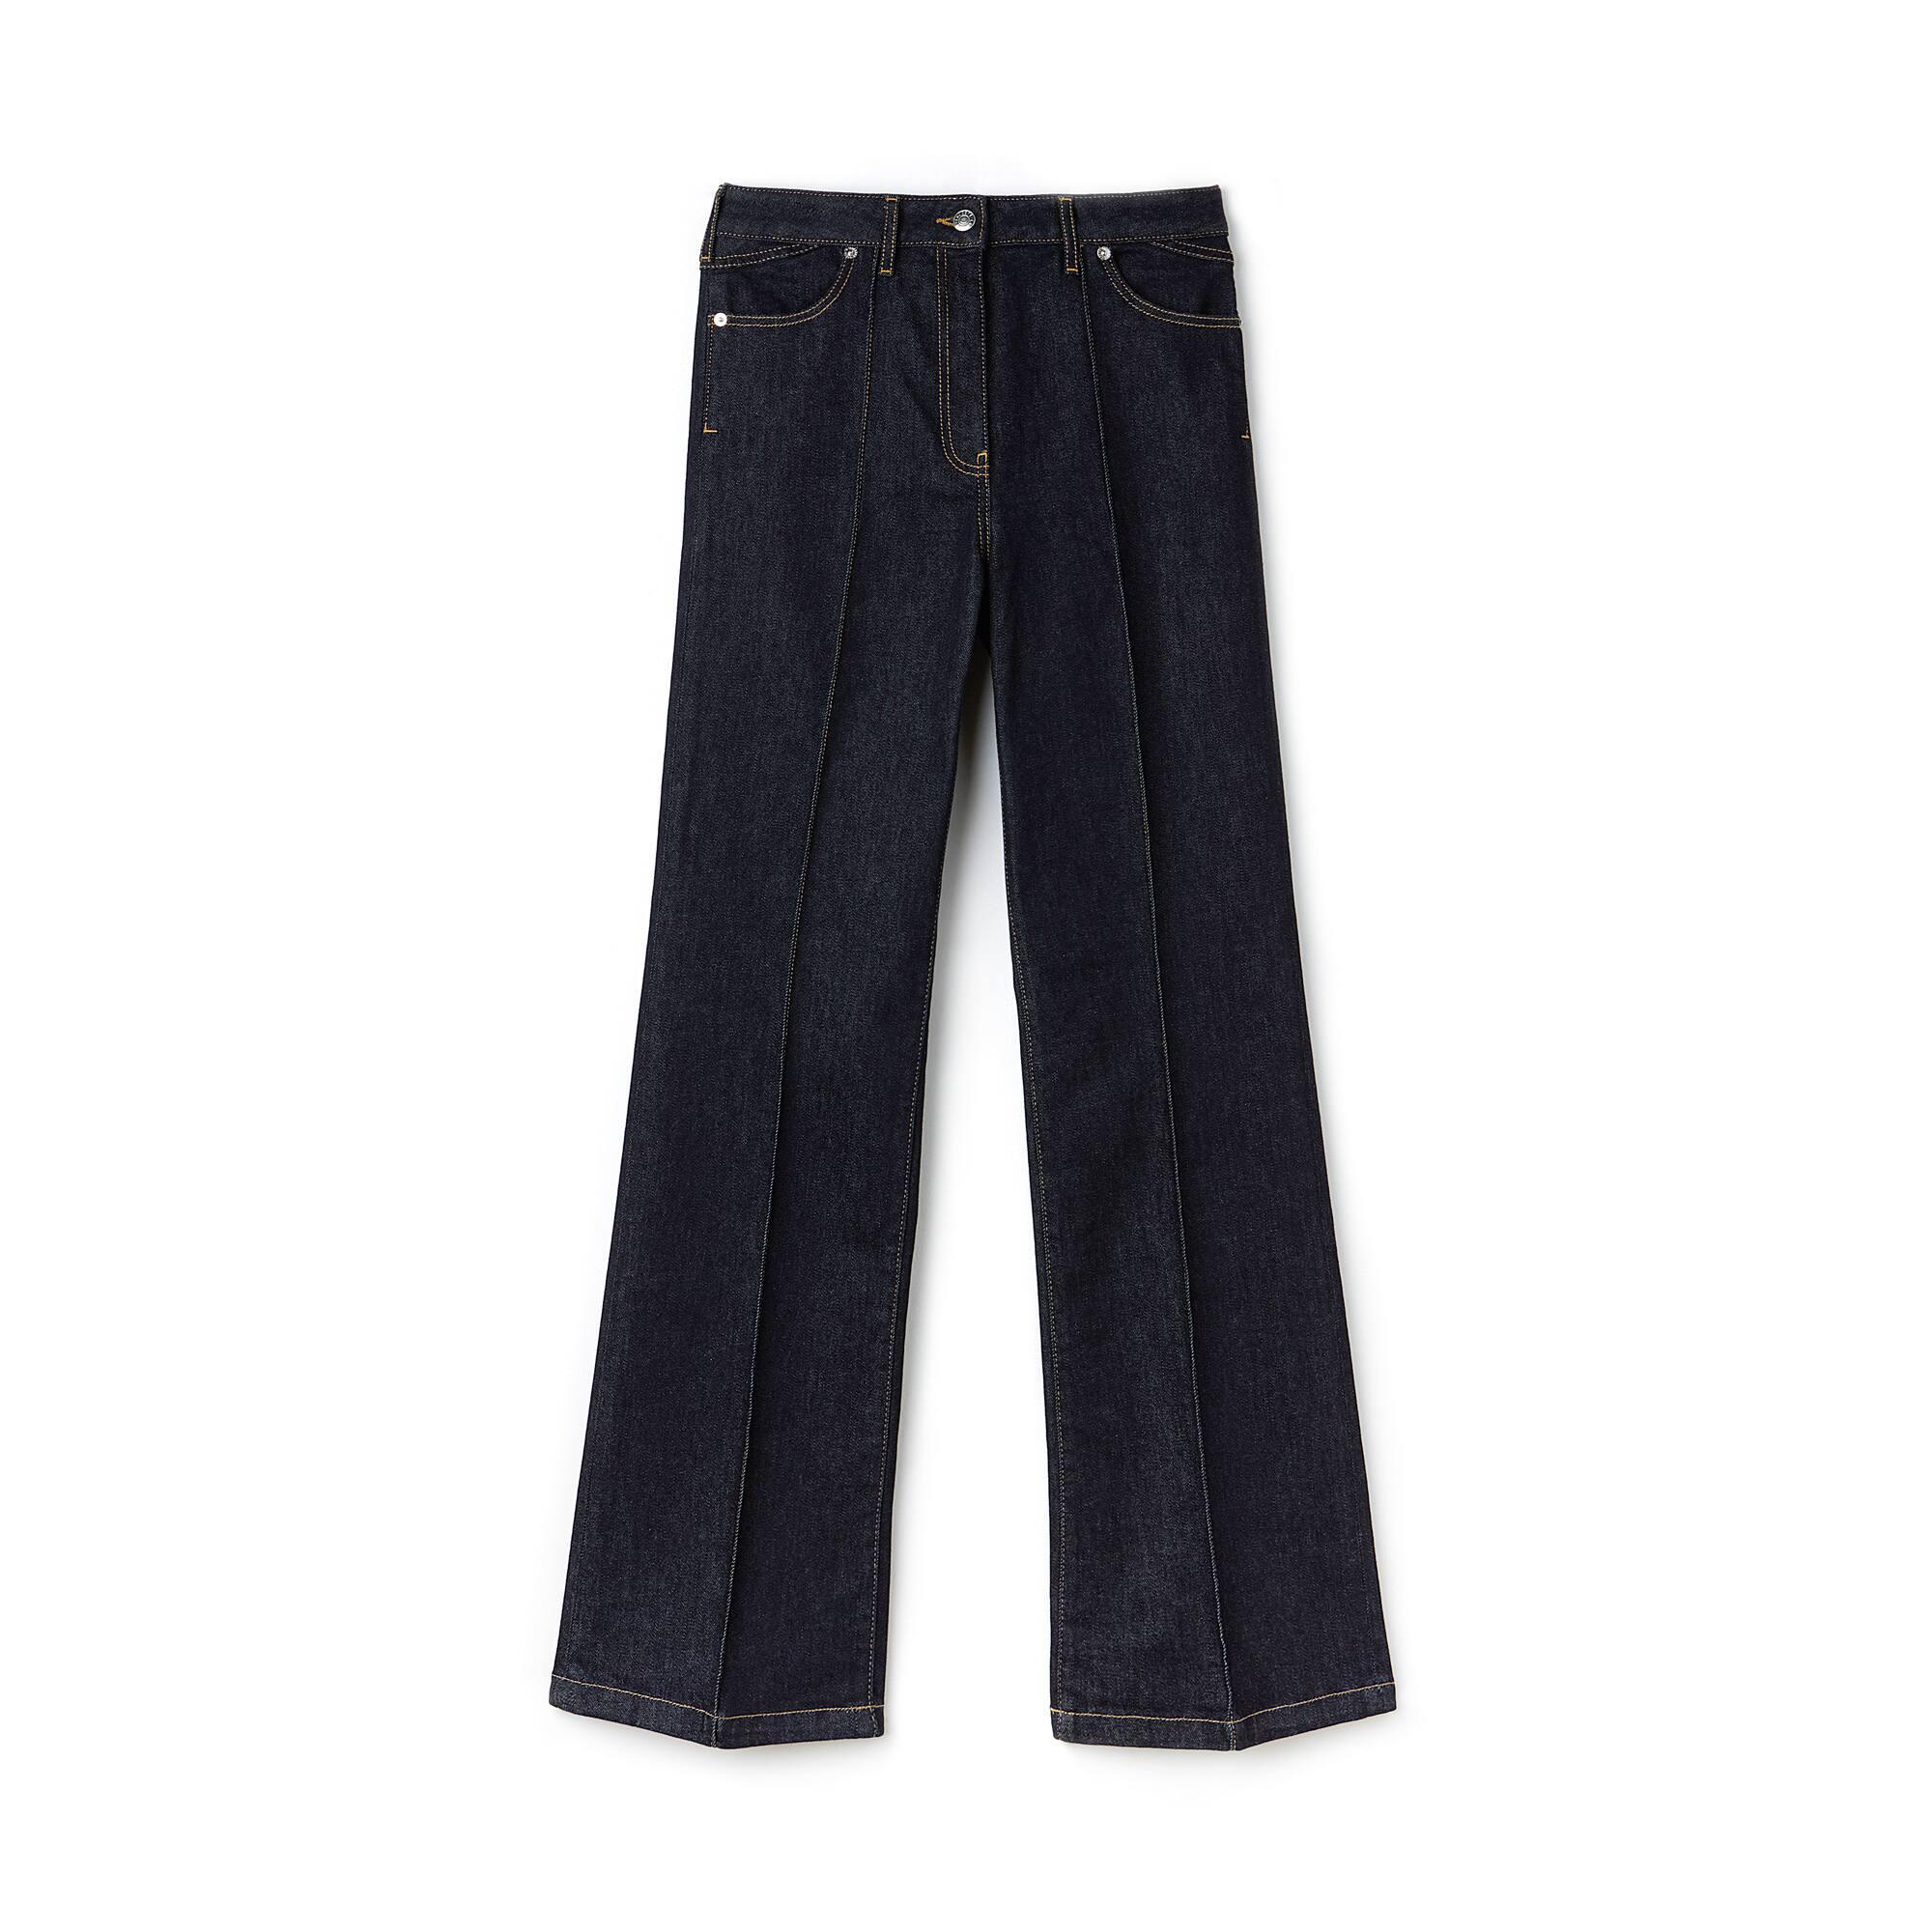 Jeans dames bootcut katoendenim met stretch